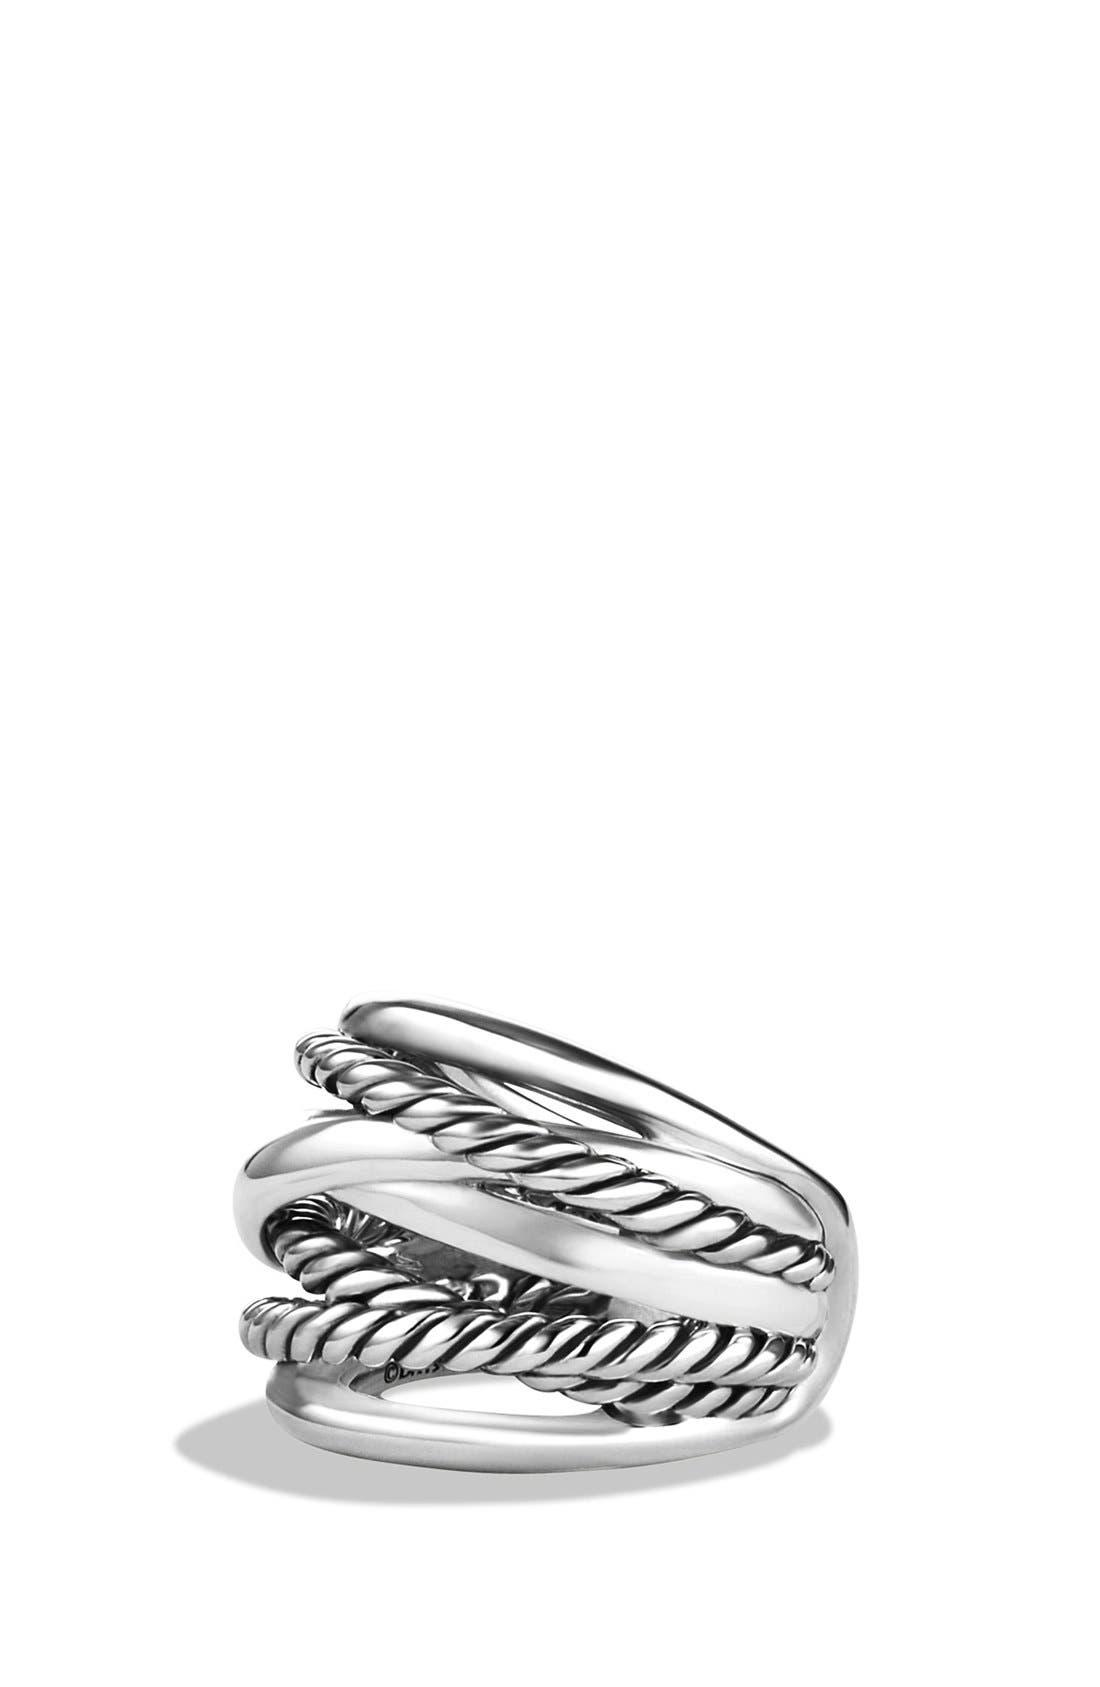 David Yurman 'Crossover' Wide Ring